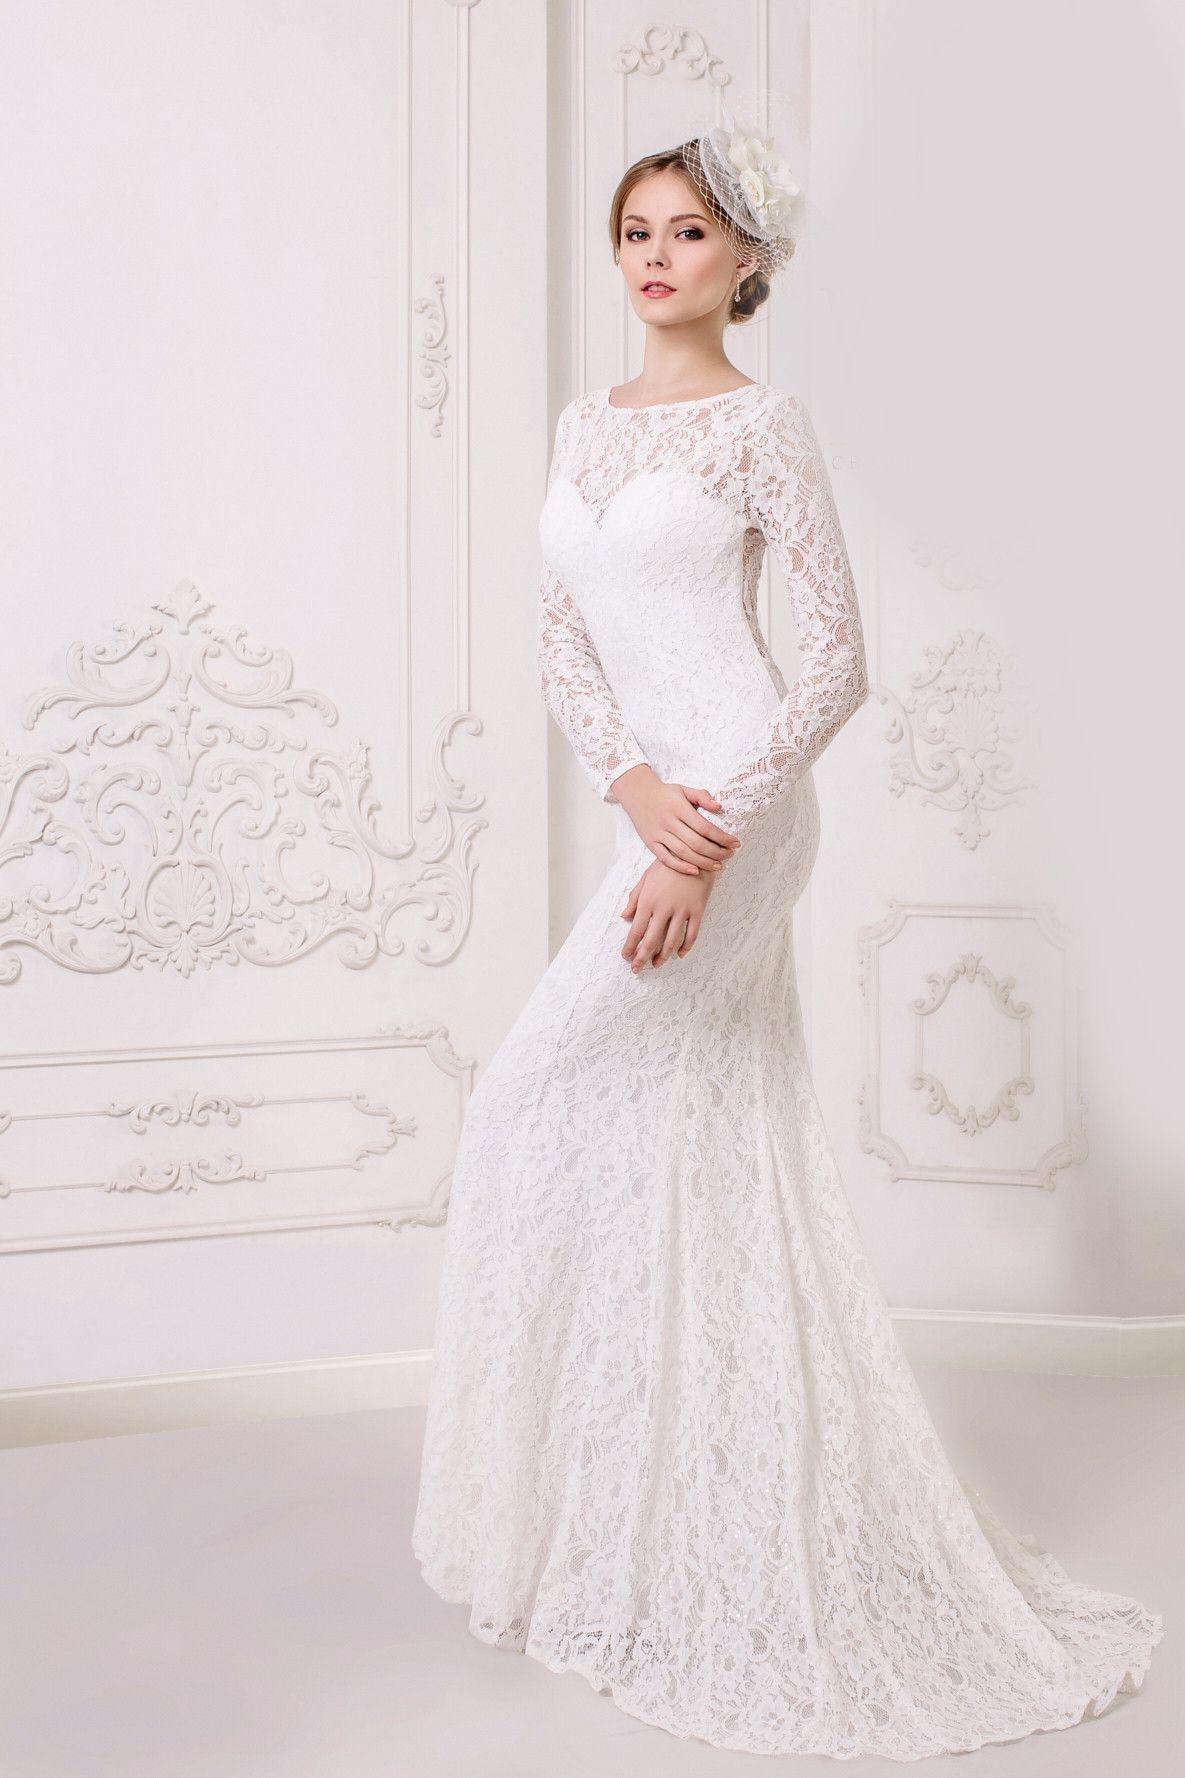 Long Sleeve Long Lace Wedding Dress for mothertobe a